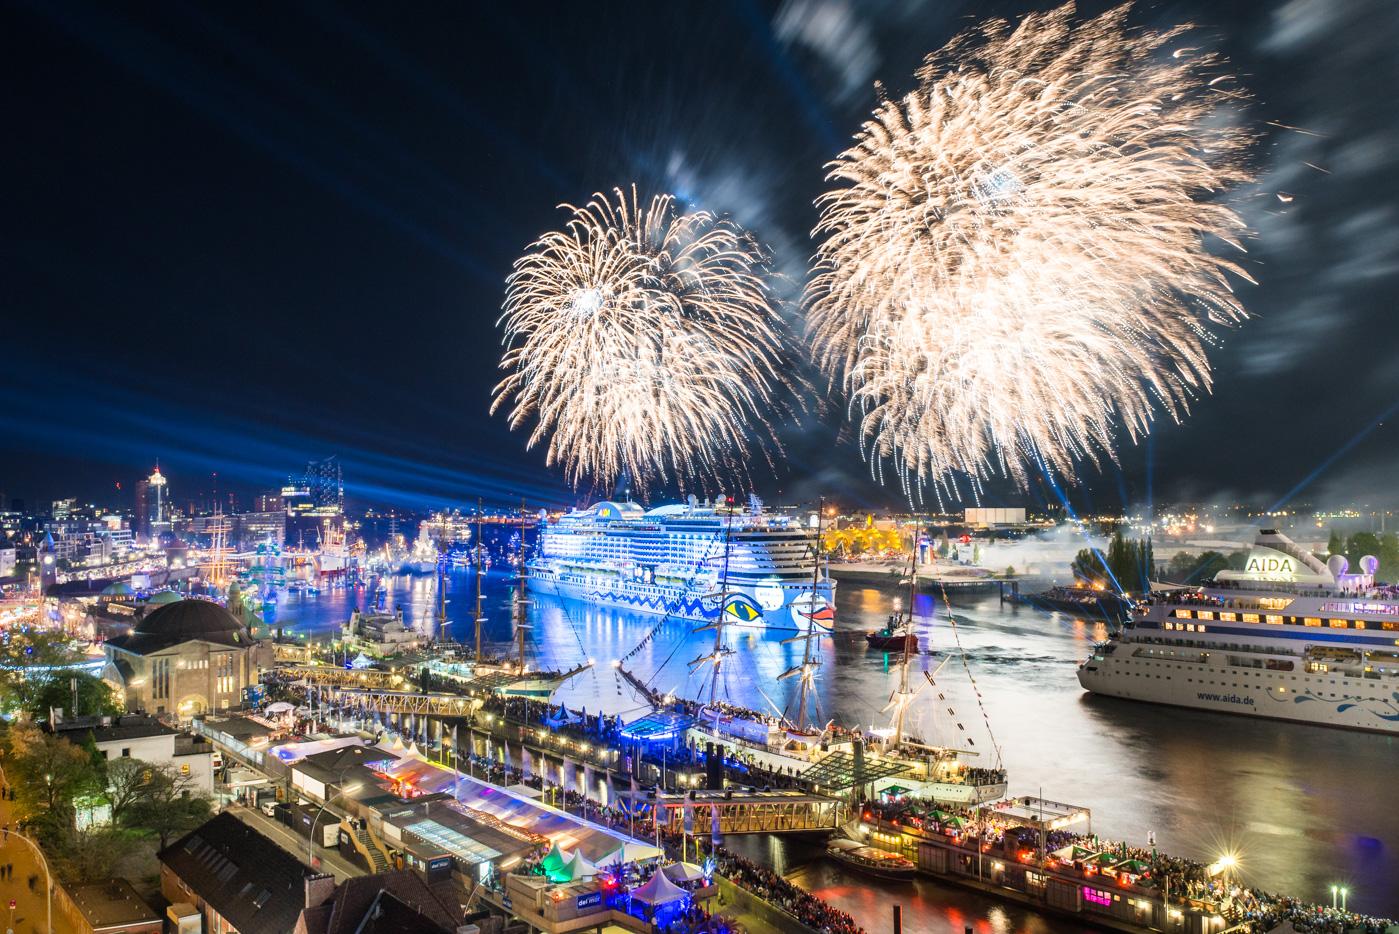 Foto-ID 2016050702 AIDA Feuerwerk Hafengeburtstag Hamburg